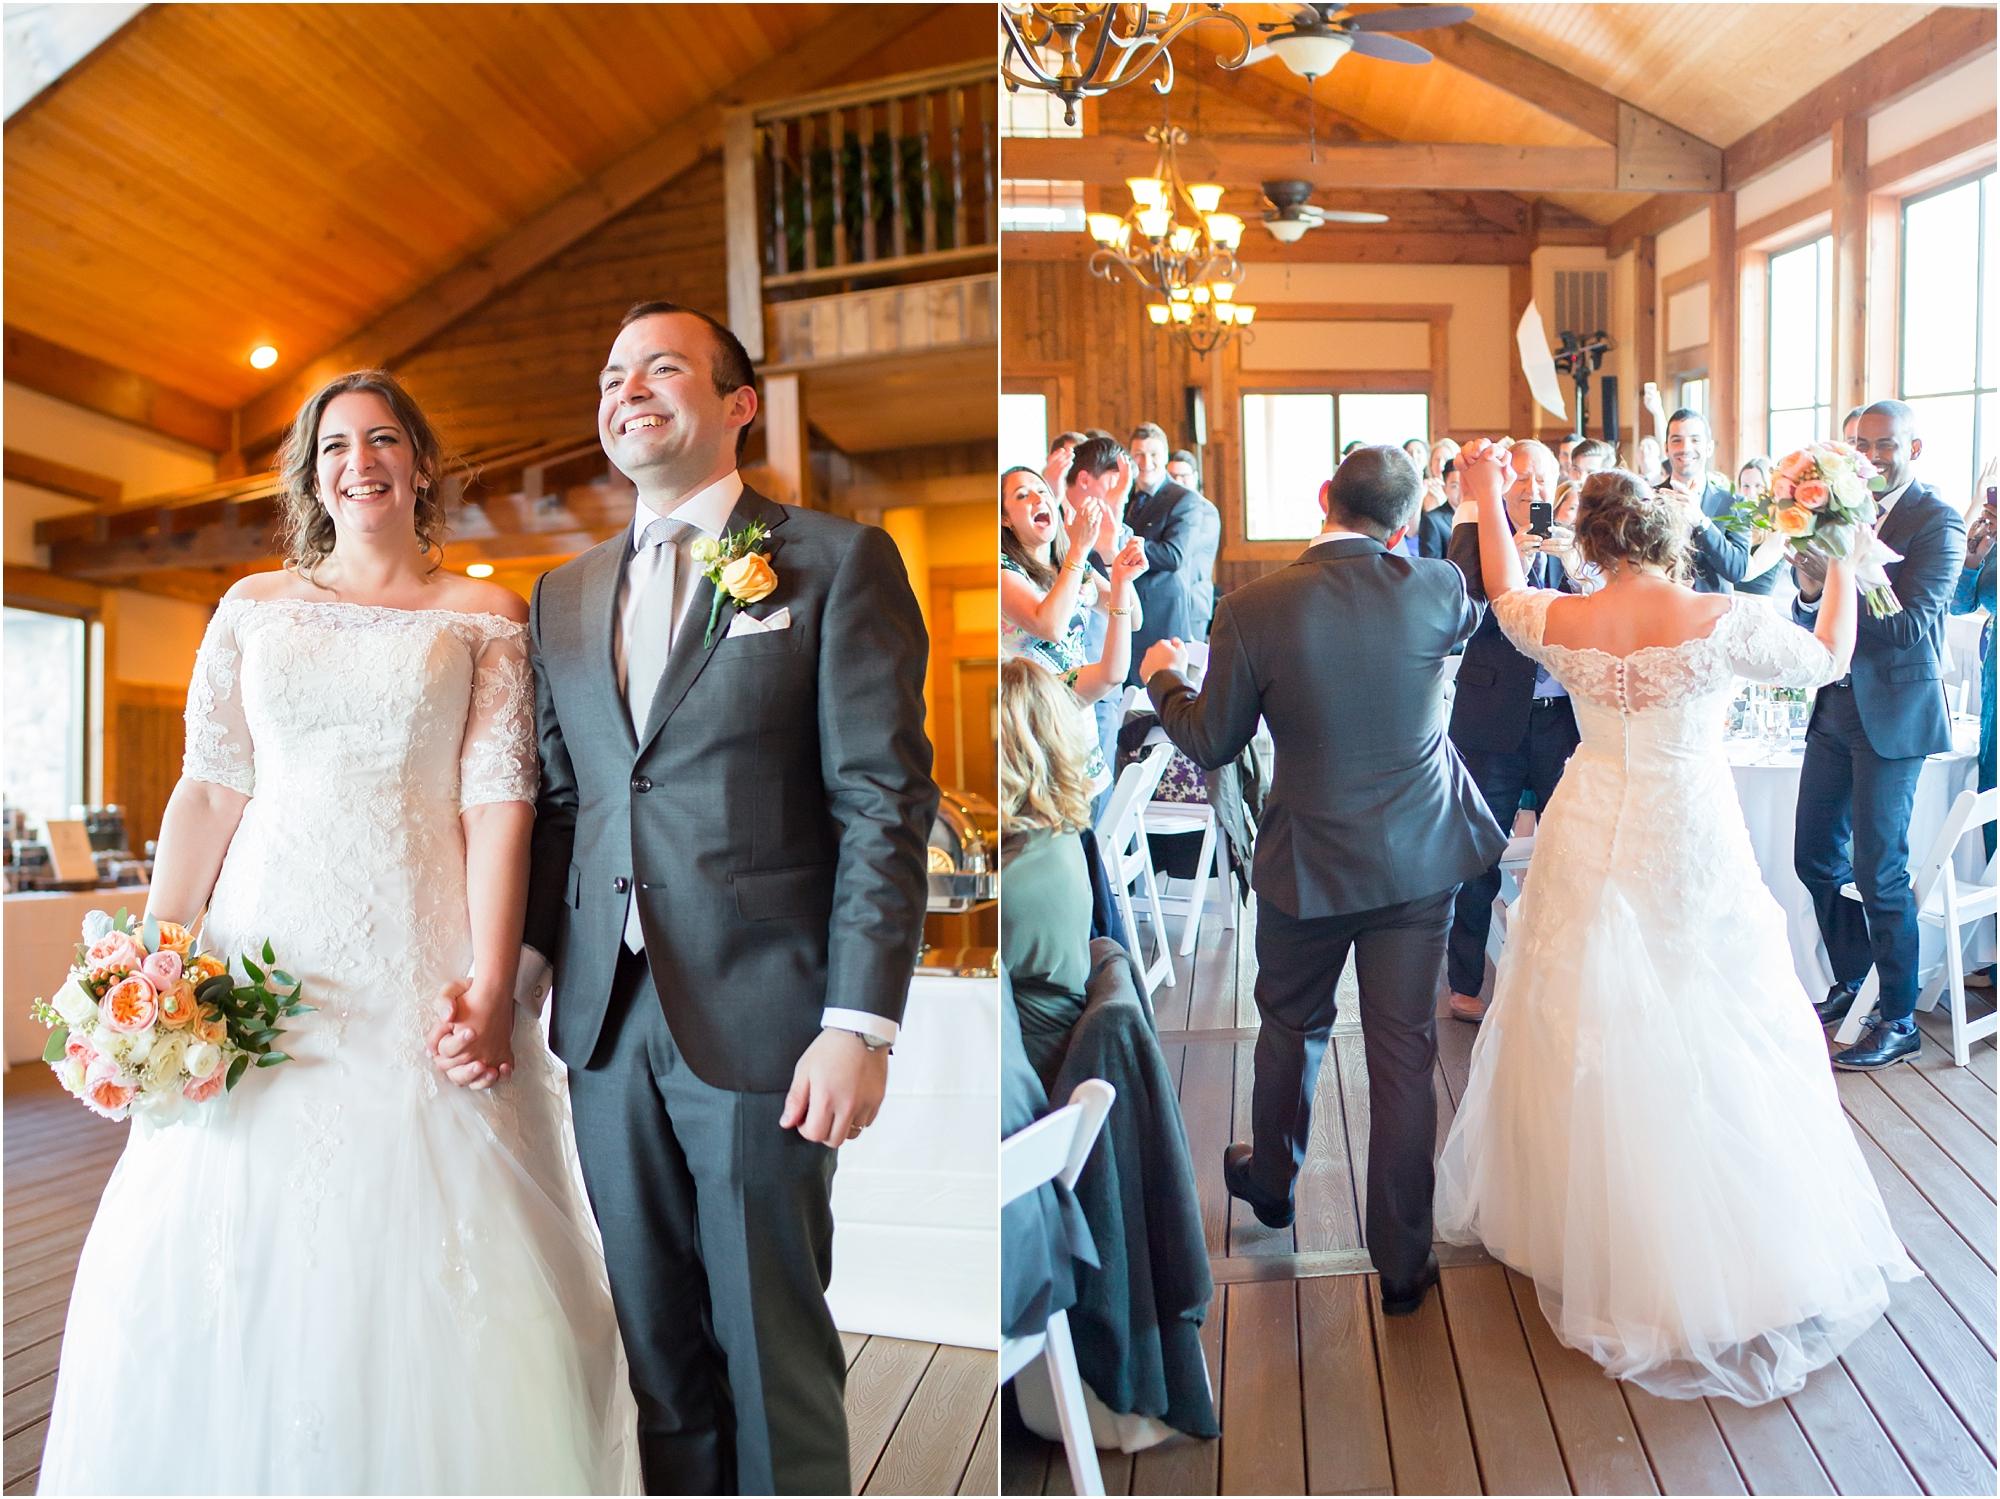 Simpson 6-Reception-895_anna grace photography virginia wedding photographer irvine estate photo.jpg